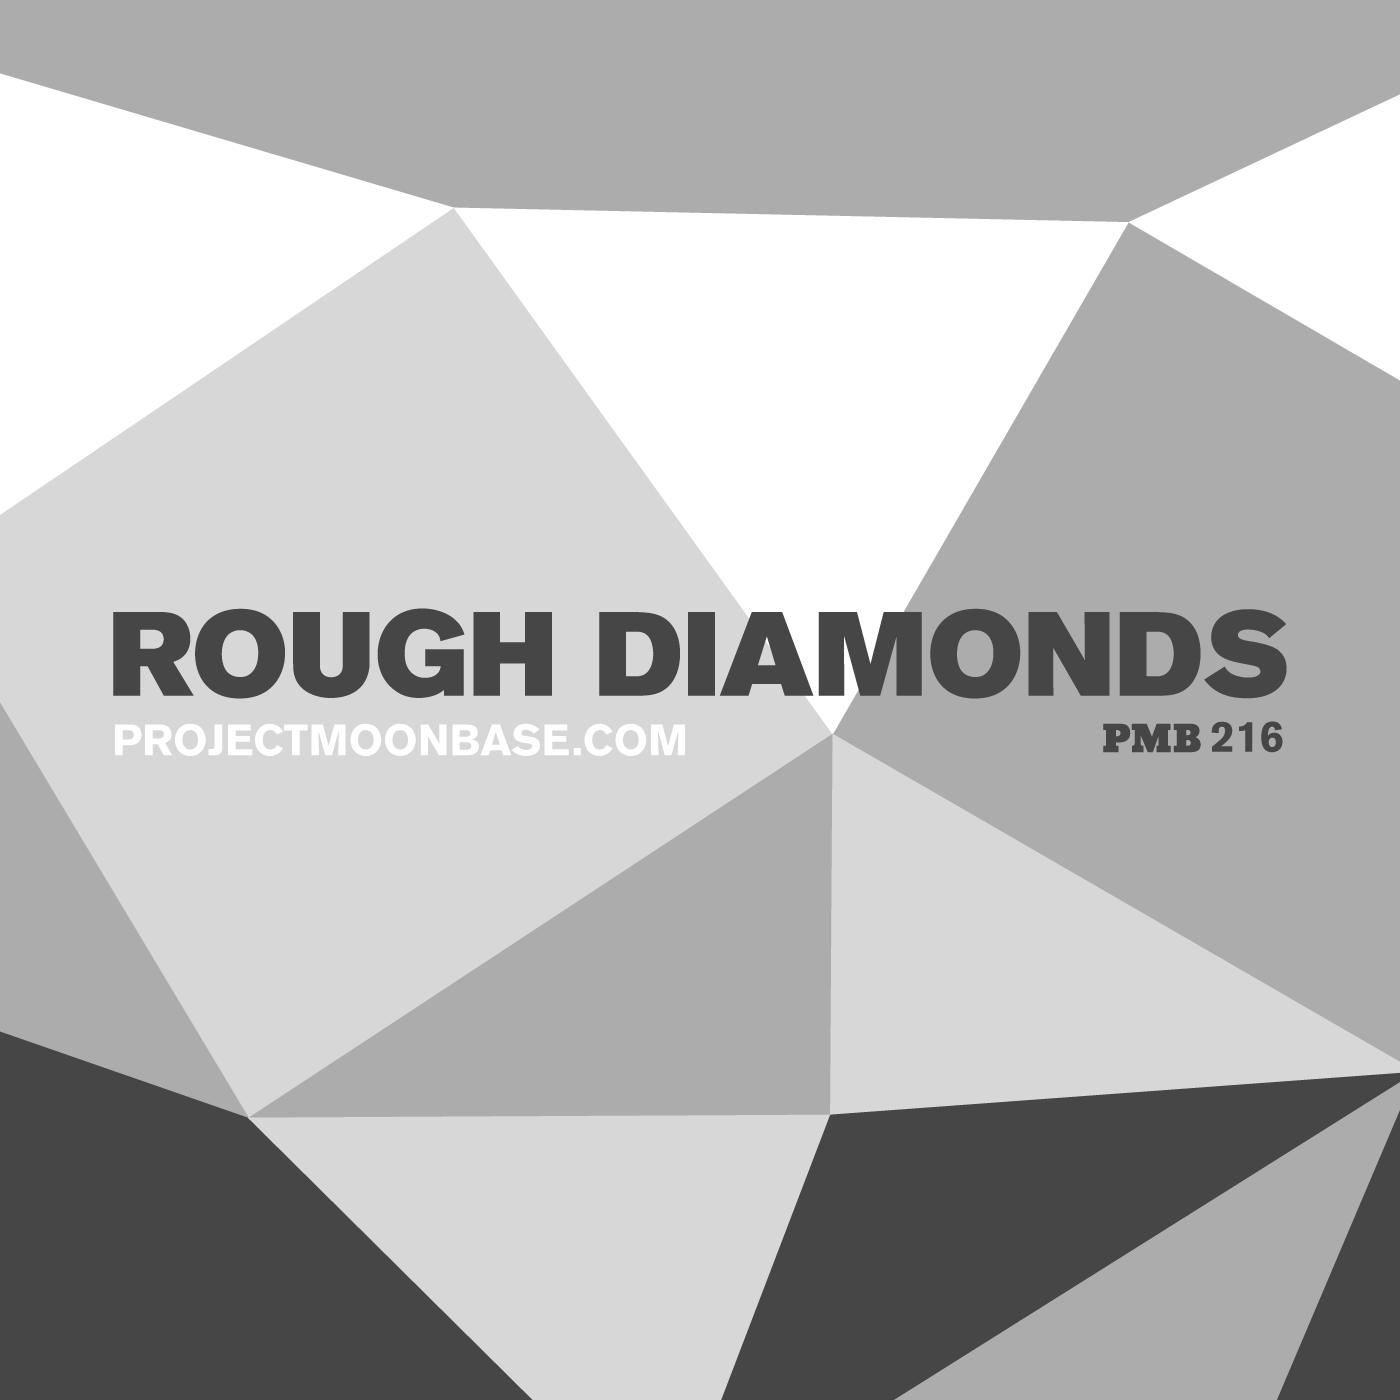 PMB216: Rough Diamonds